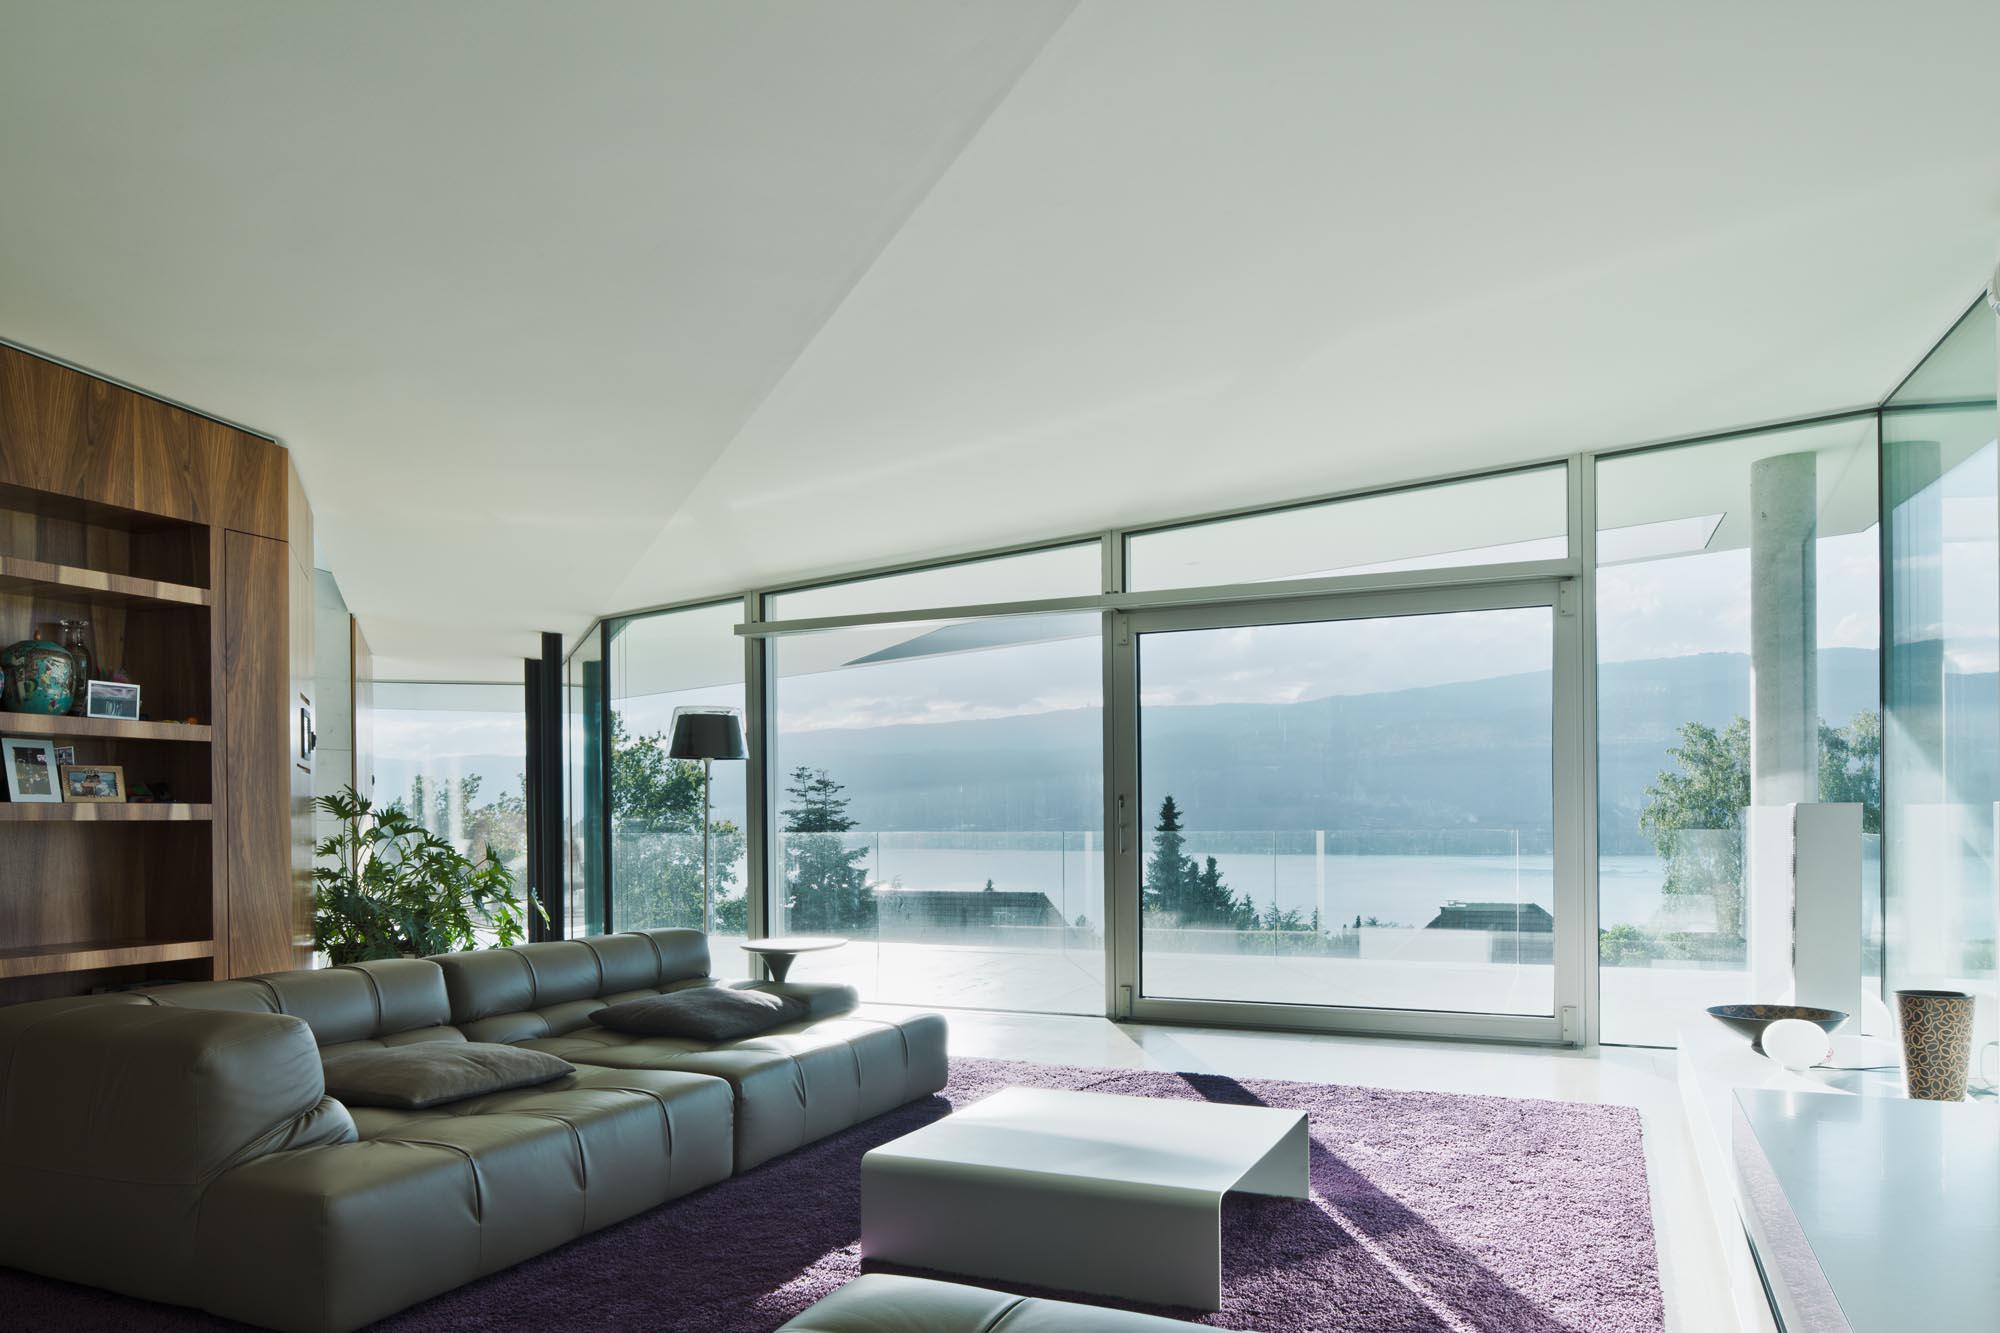 mlzd projects. Black Bedroom Furniture Sets. Home Design Ideas